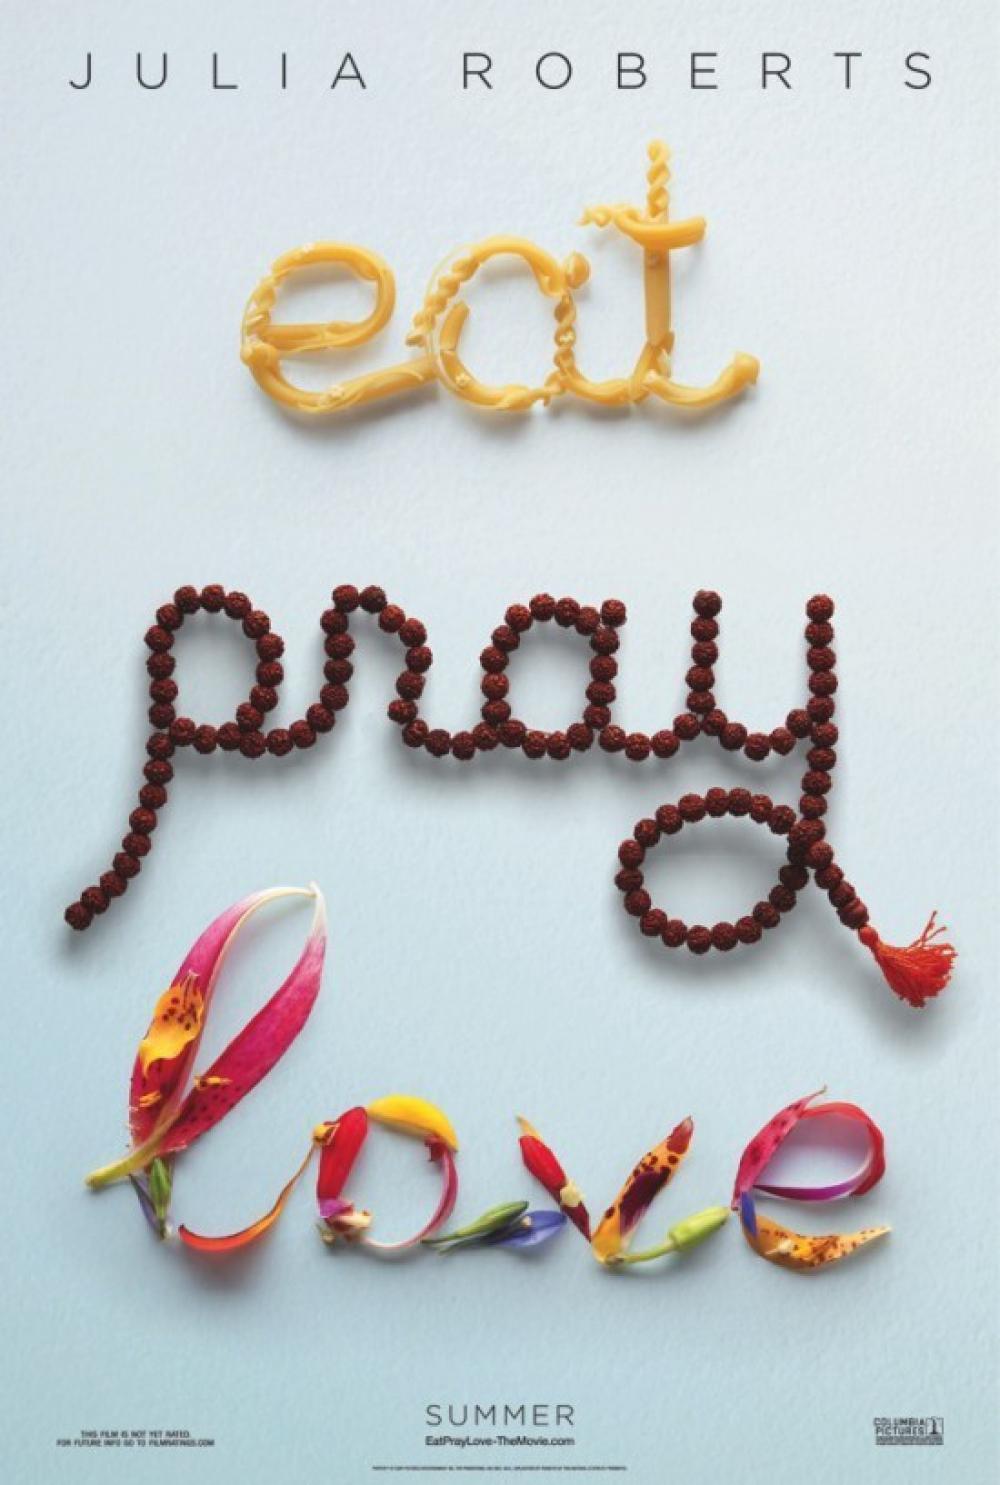 Eat, Pray, Love Trailer: Love it!